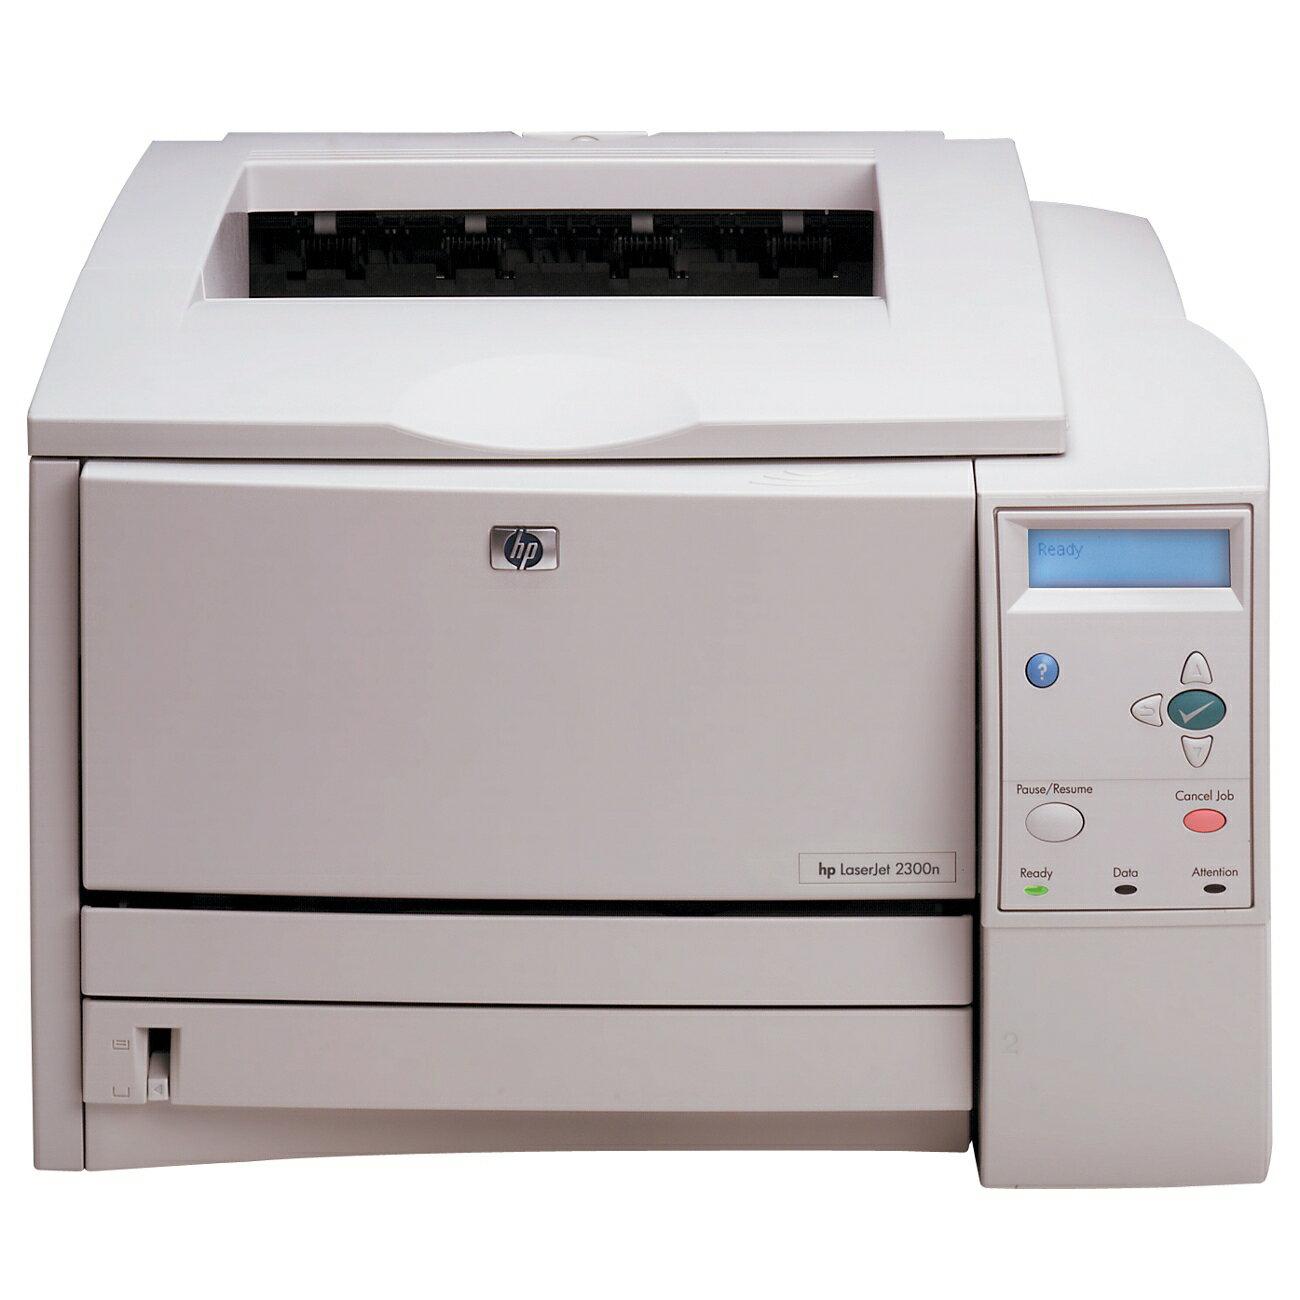 HP LaserJet 2300N Laser Printer - Monochrome - 1200 x 1200 dpi Print - Plain Paper Print - Desktop - 25 ppm Mono Print - Letter, Legal, Executive, Letter - 700 sheets Standard Input Capacity - 50000 Duty Cycle - Manual Duplex Print - Ethernet 0